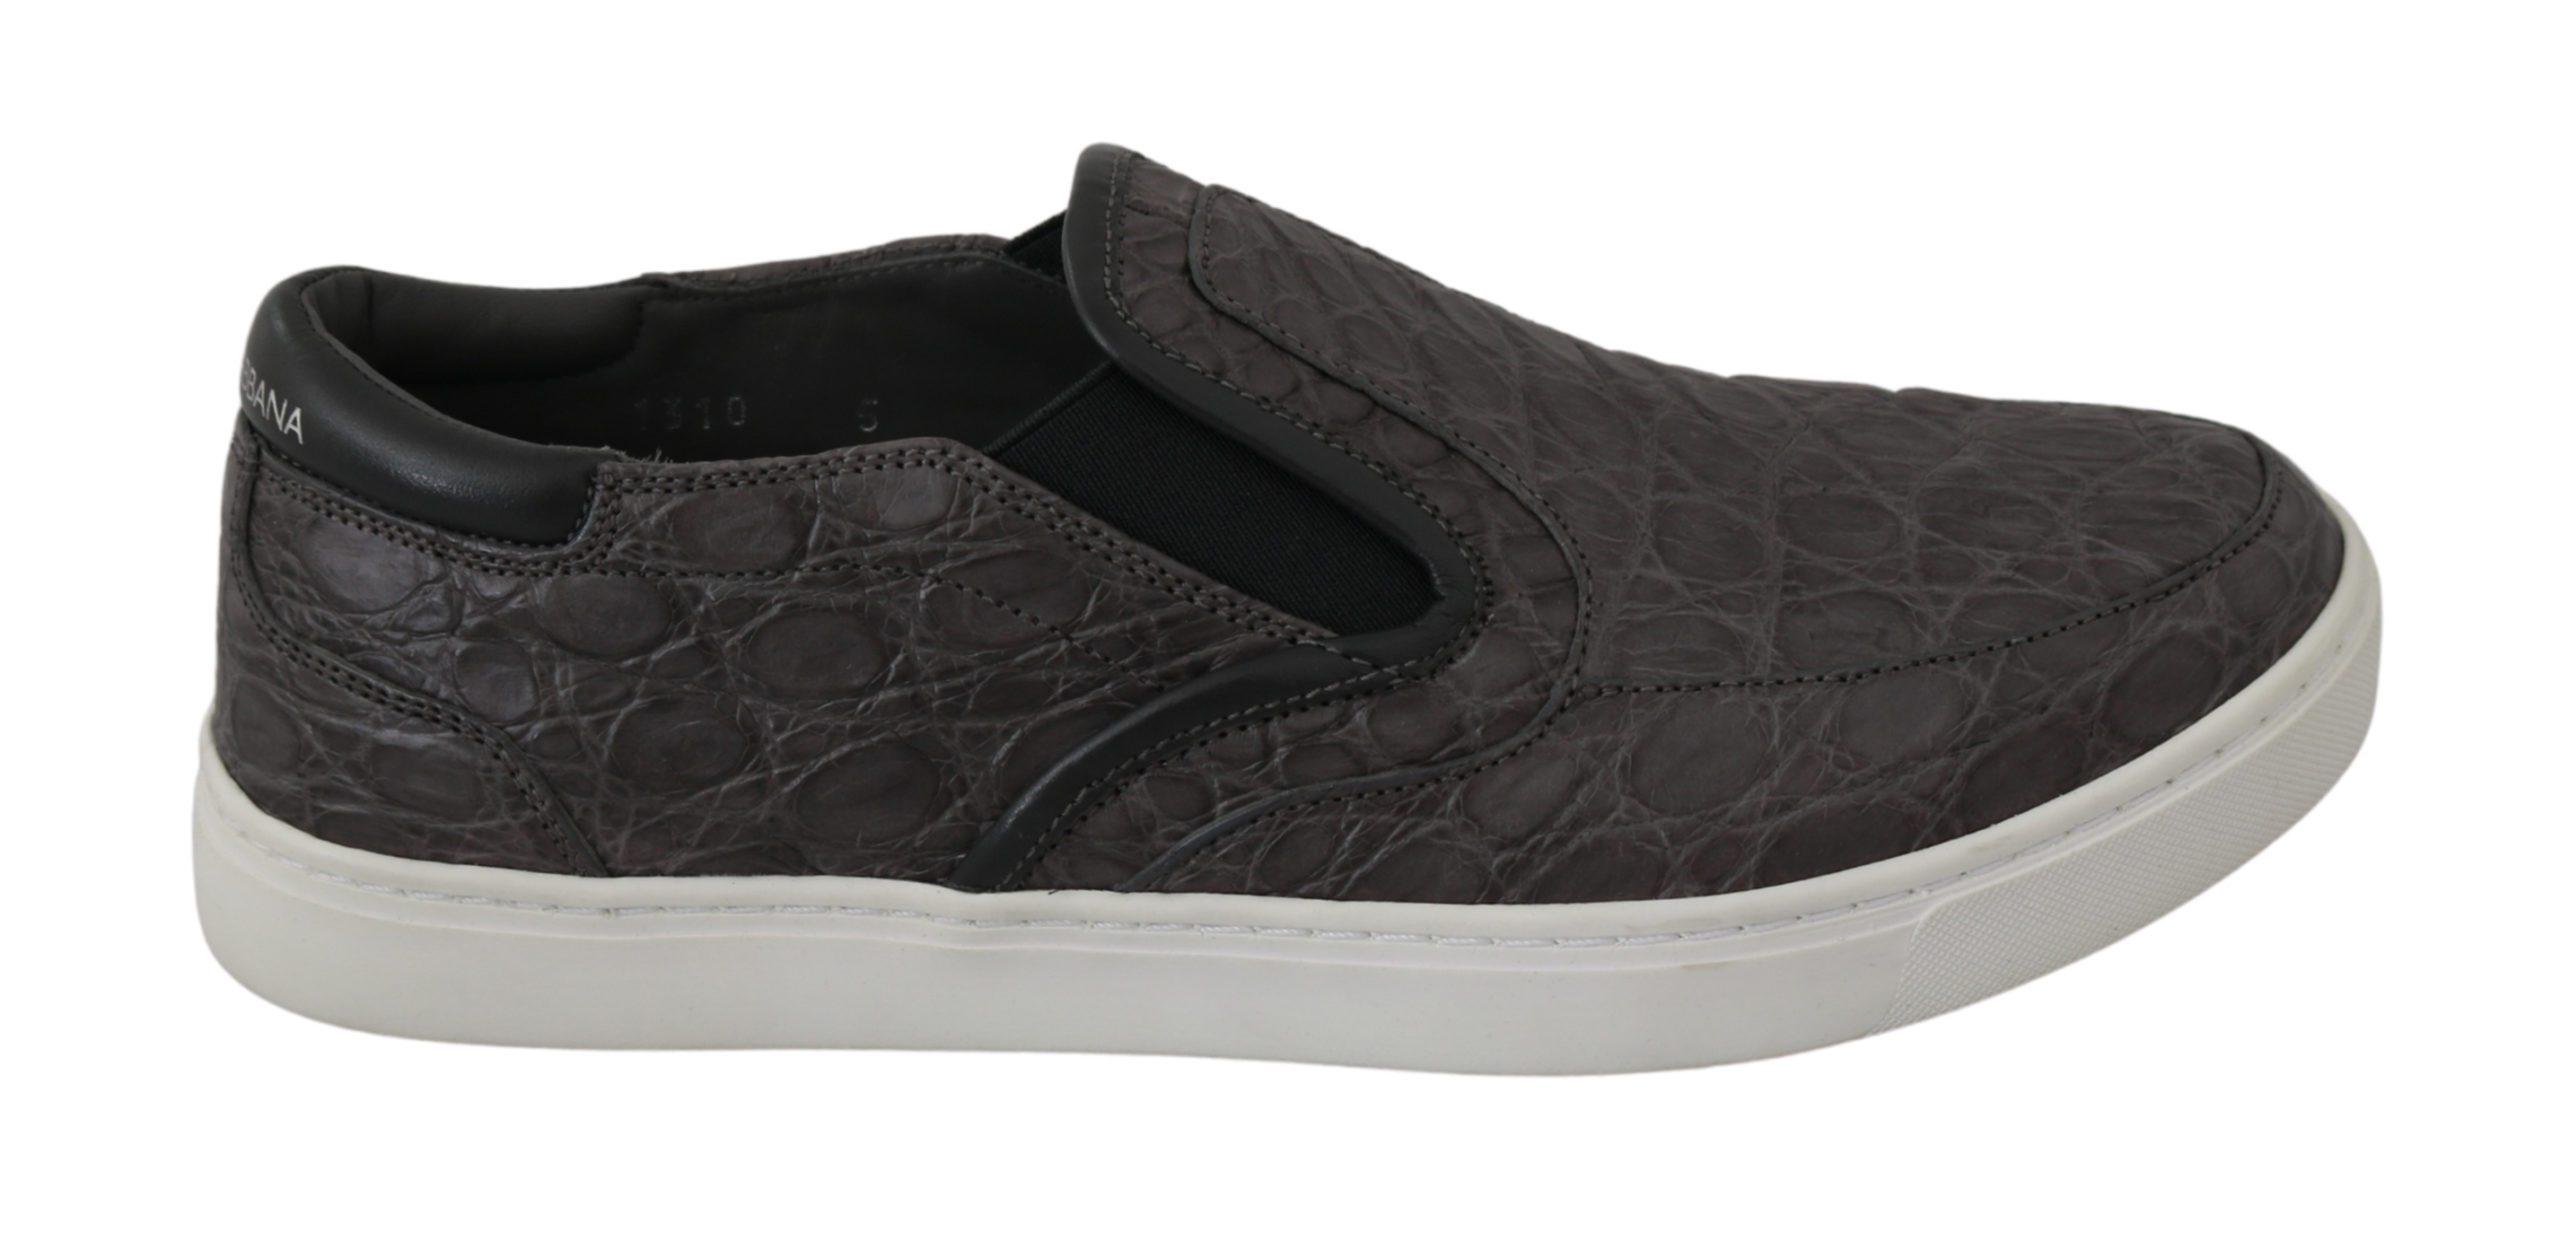 Dolce & Gabbana Men's Leather Caiman Loafers Shoes Gray MV2676 - EU39/US6